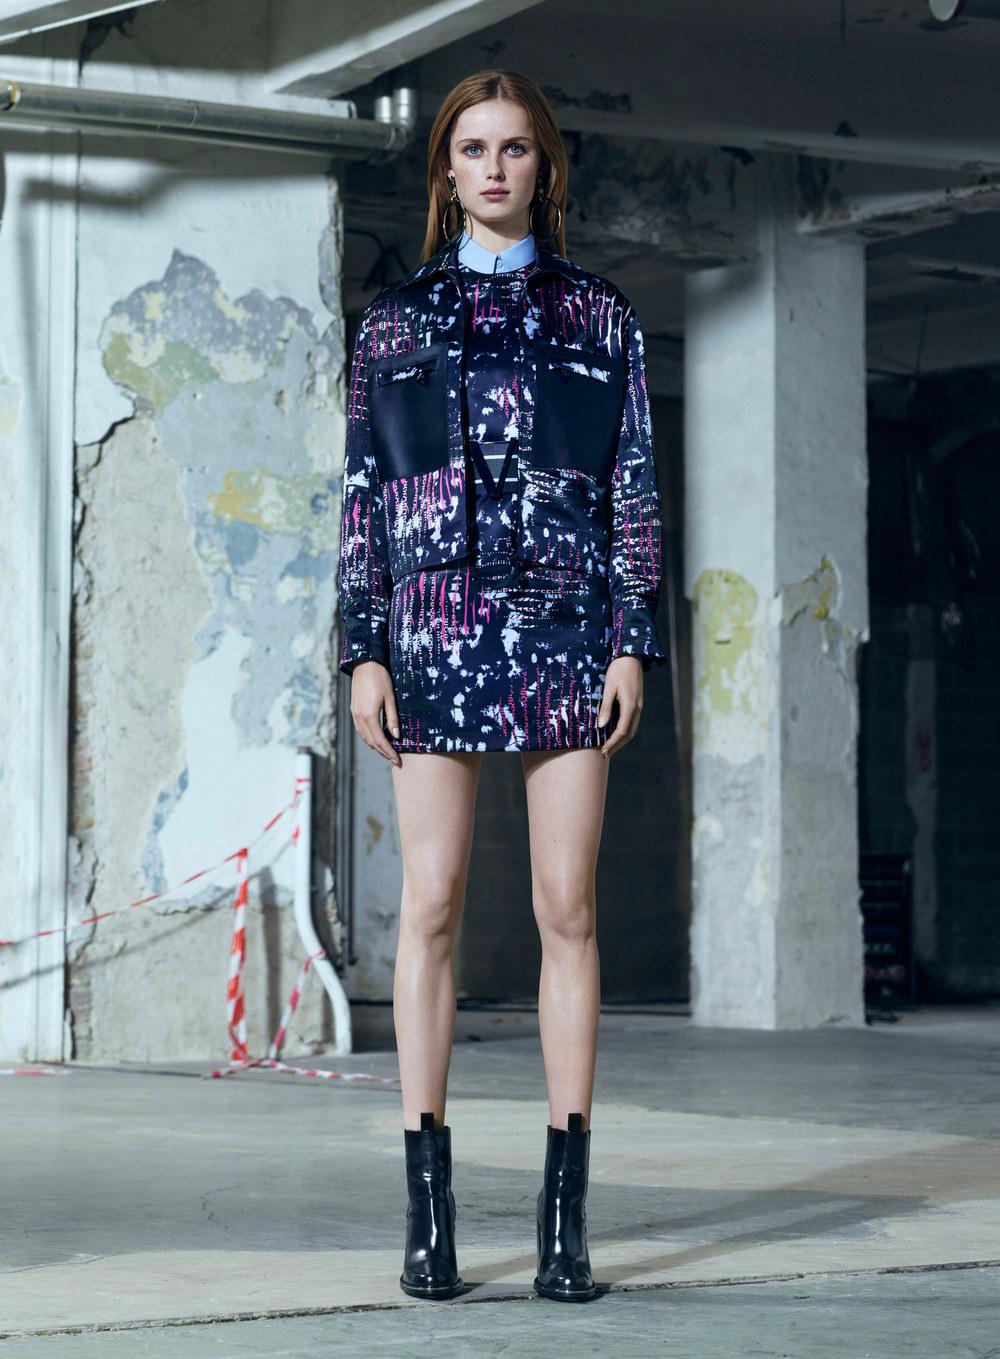 versace-pre-fall-2016-lookbook-04.jpg